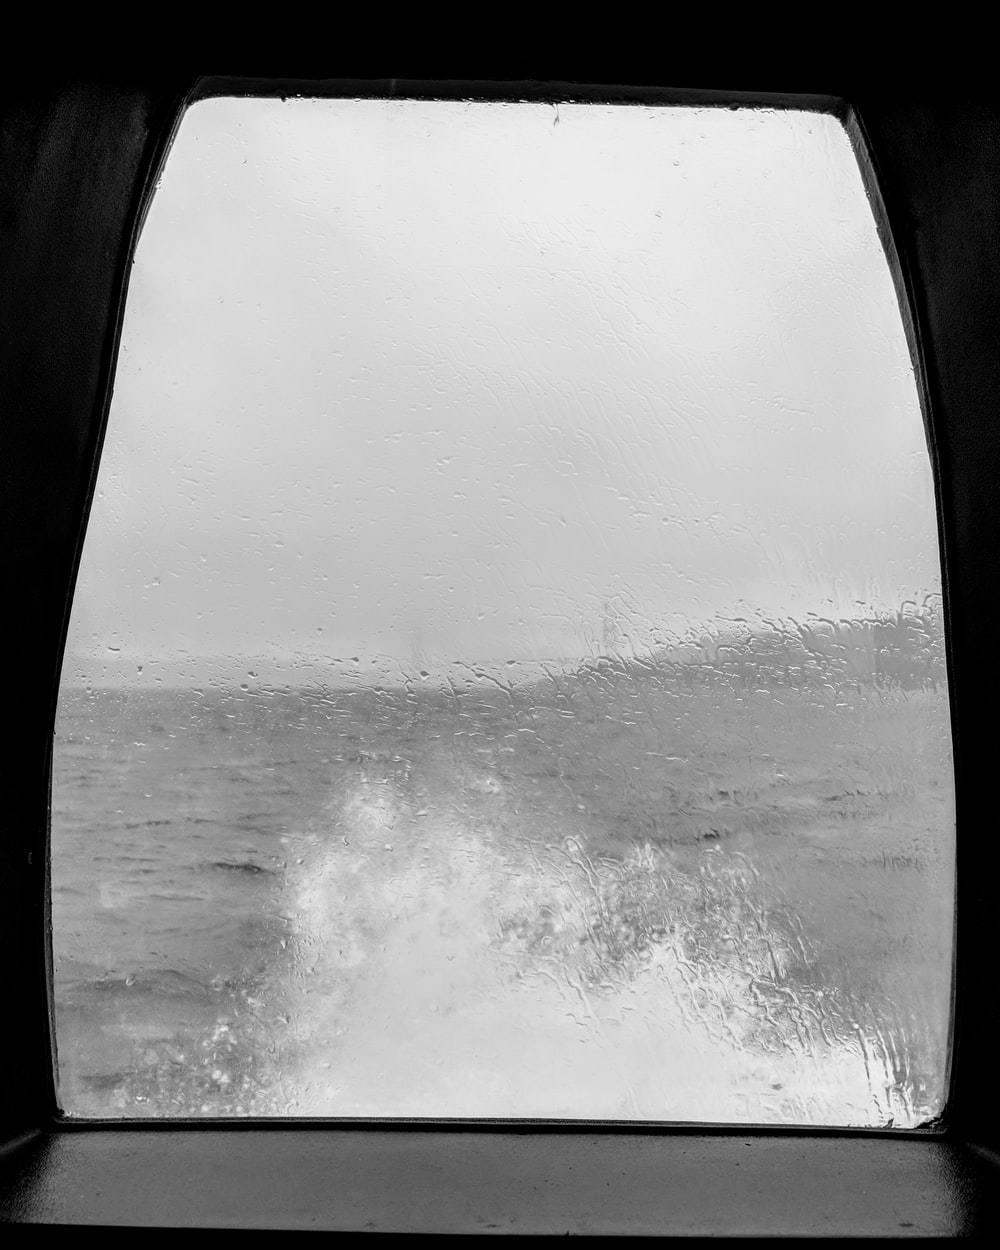 sea waves splashing trough boat window